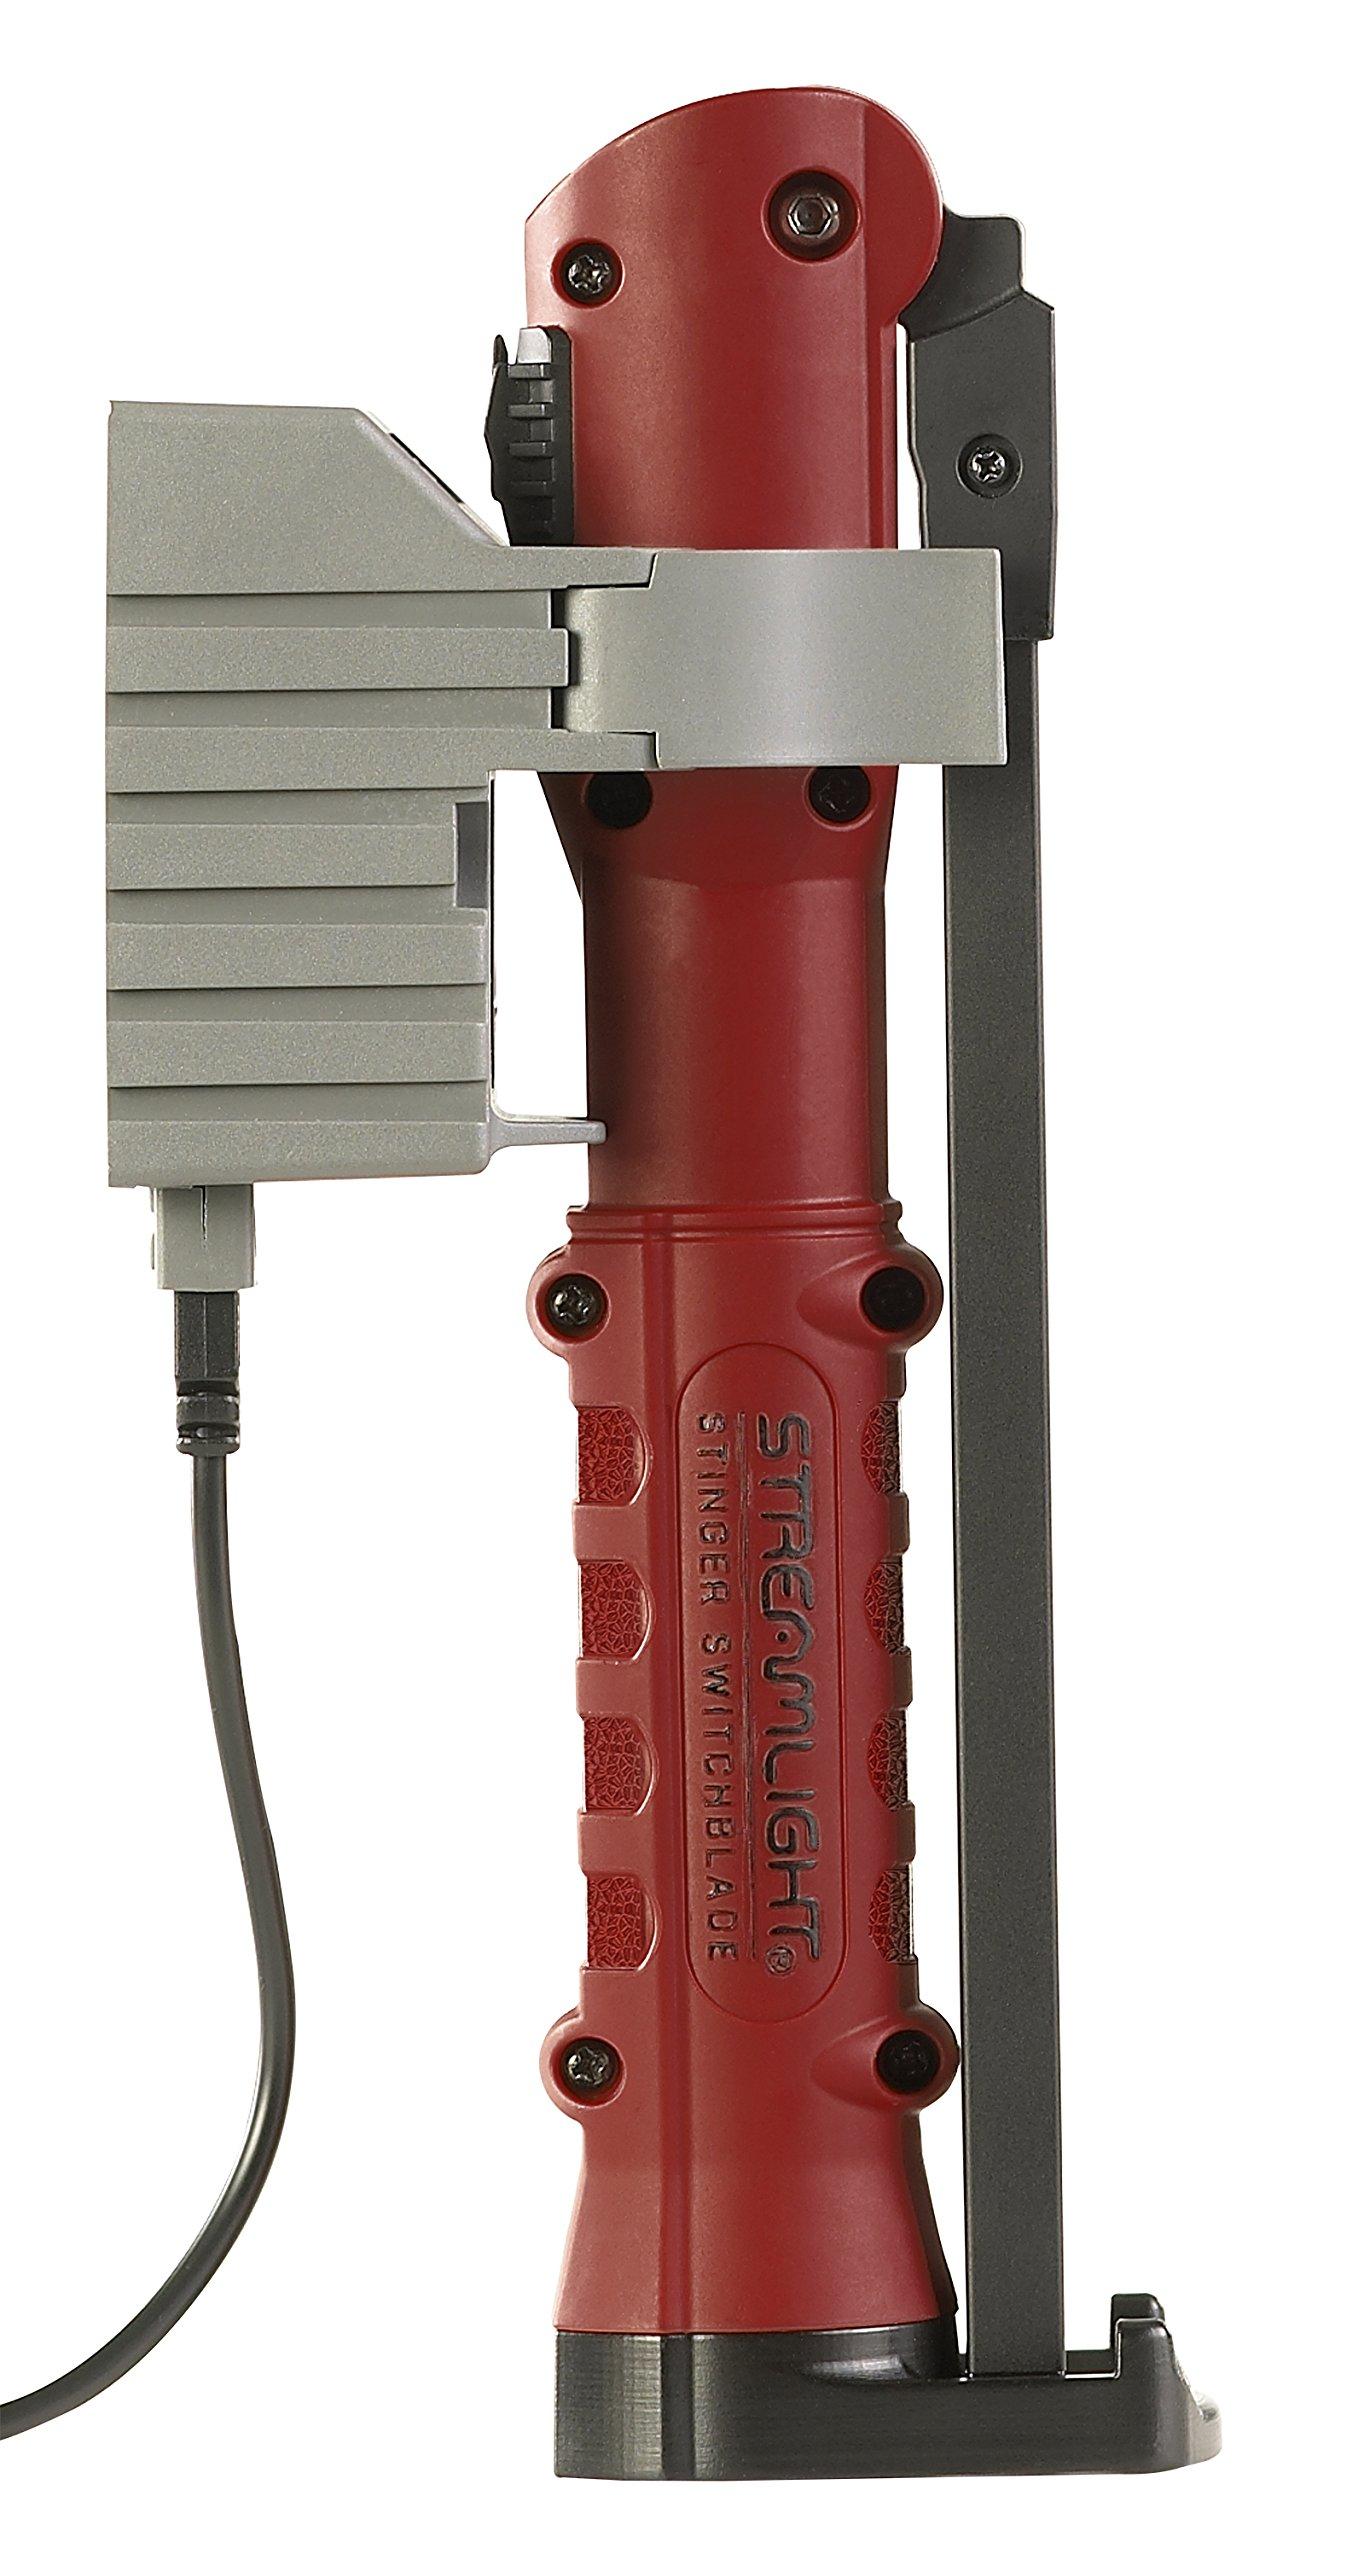 Streamlight 76800 Stinger Switchblade USB Cord Red Flashlight - 800 Lumens by Streamlight